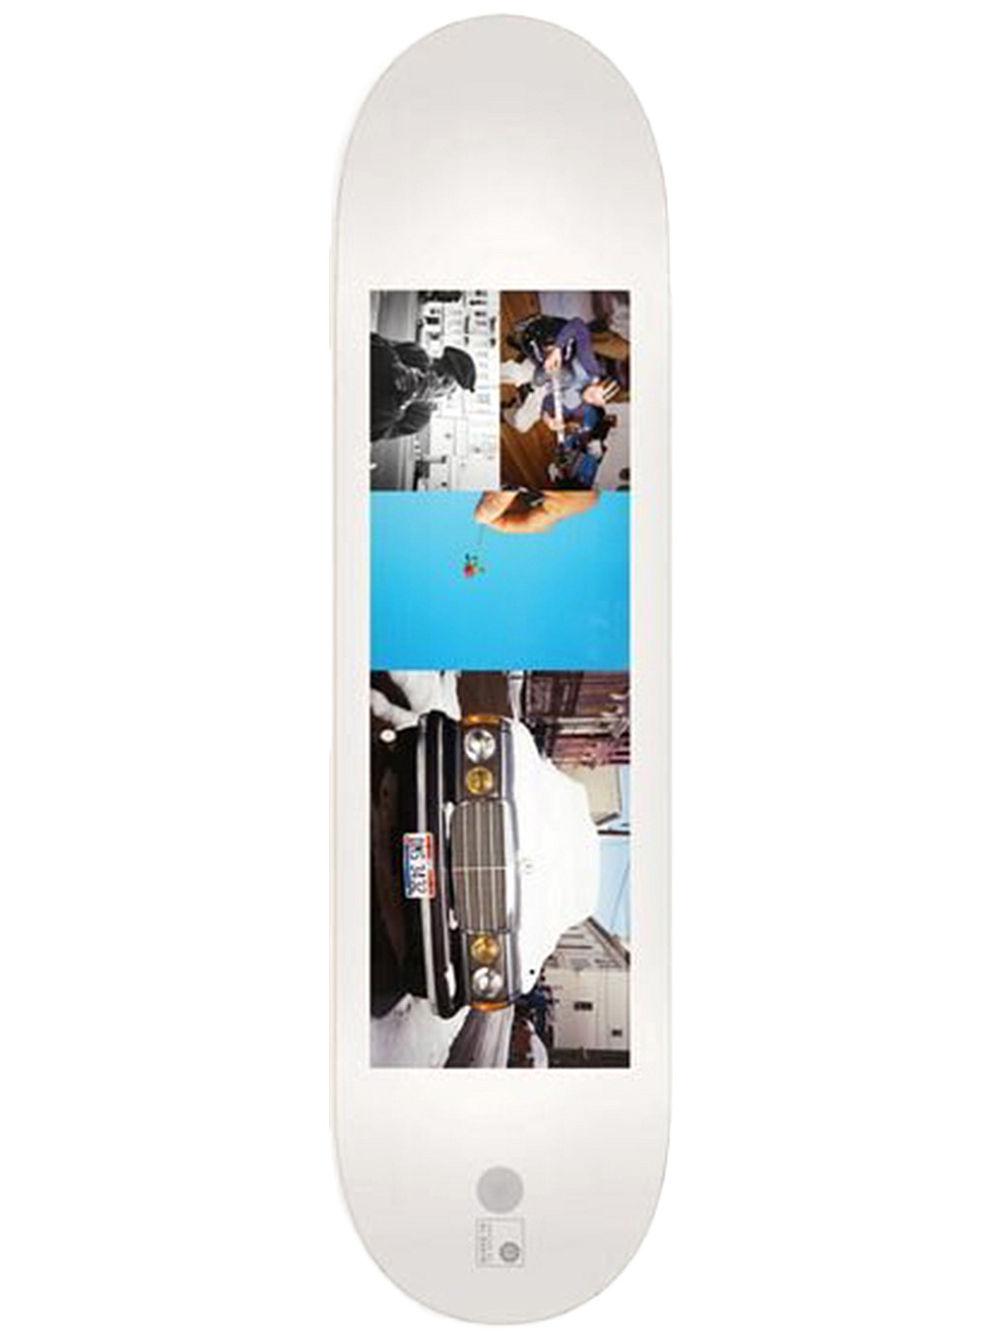 davis-shoot-film-825-skateboard-deck